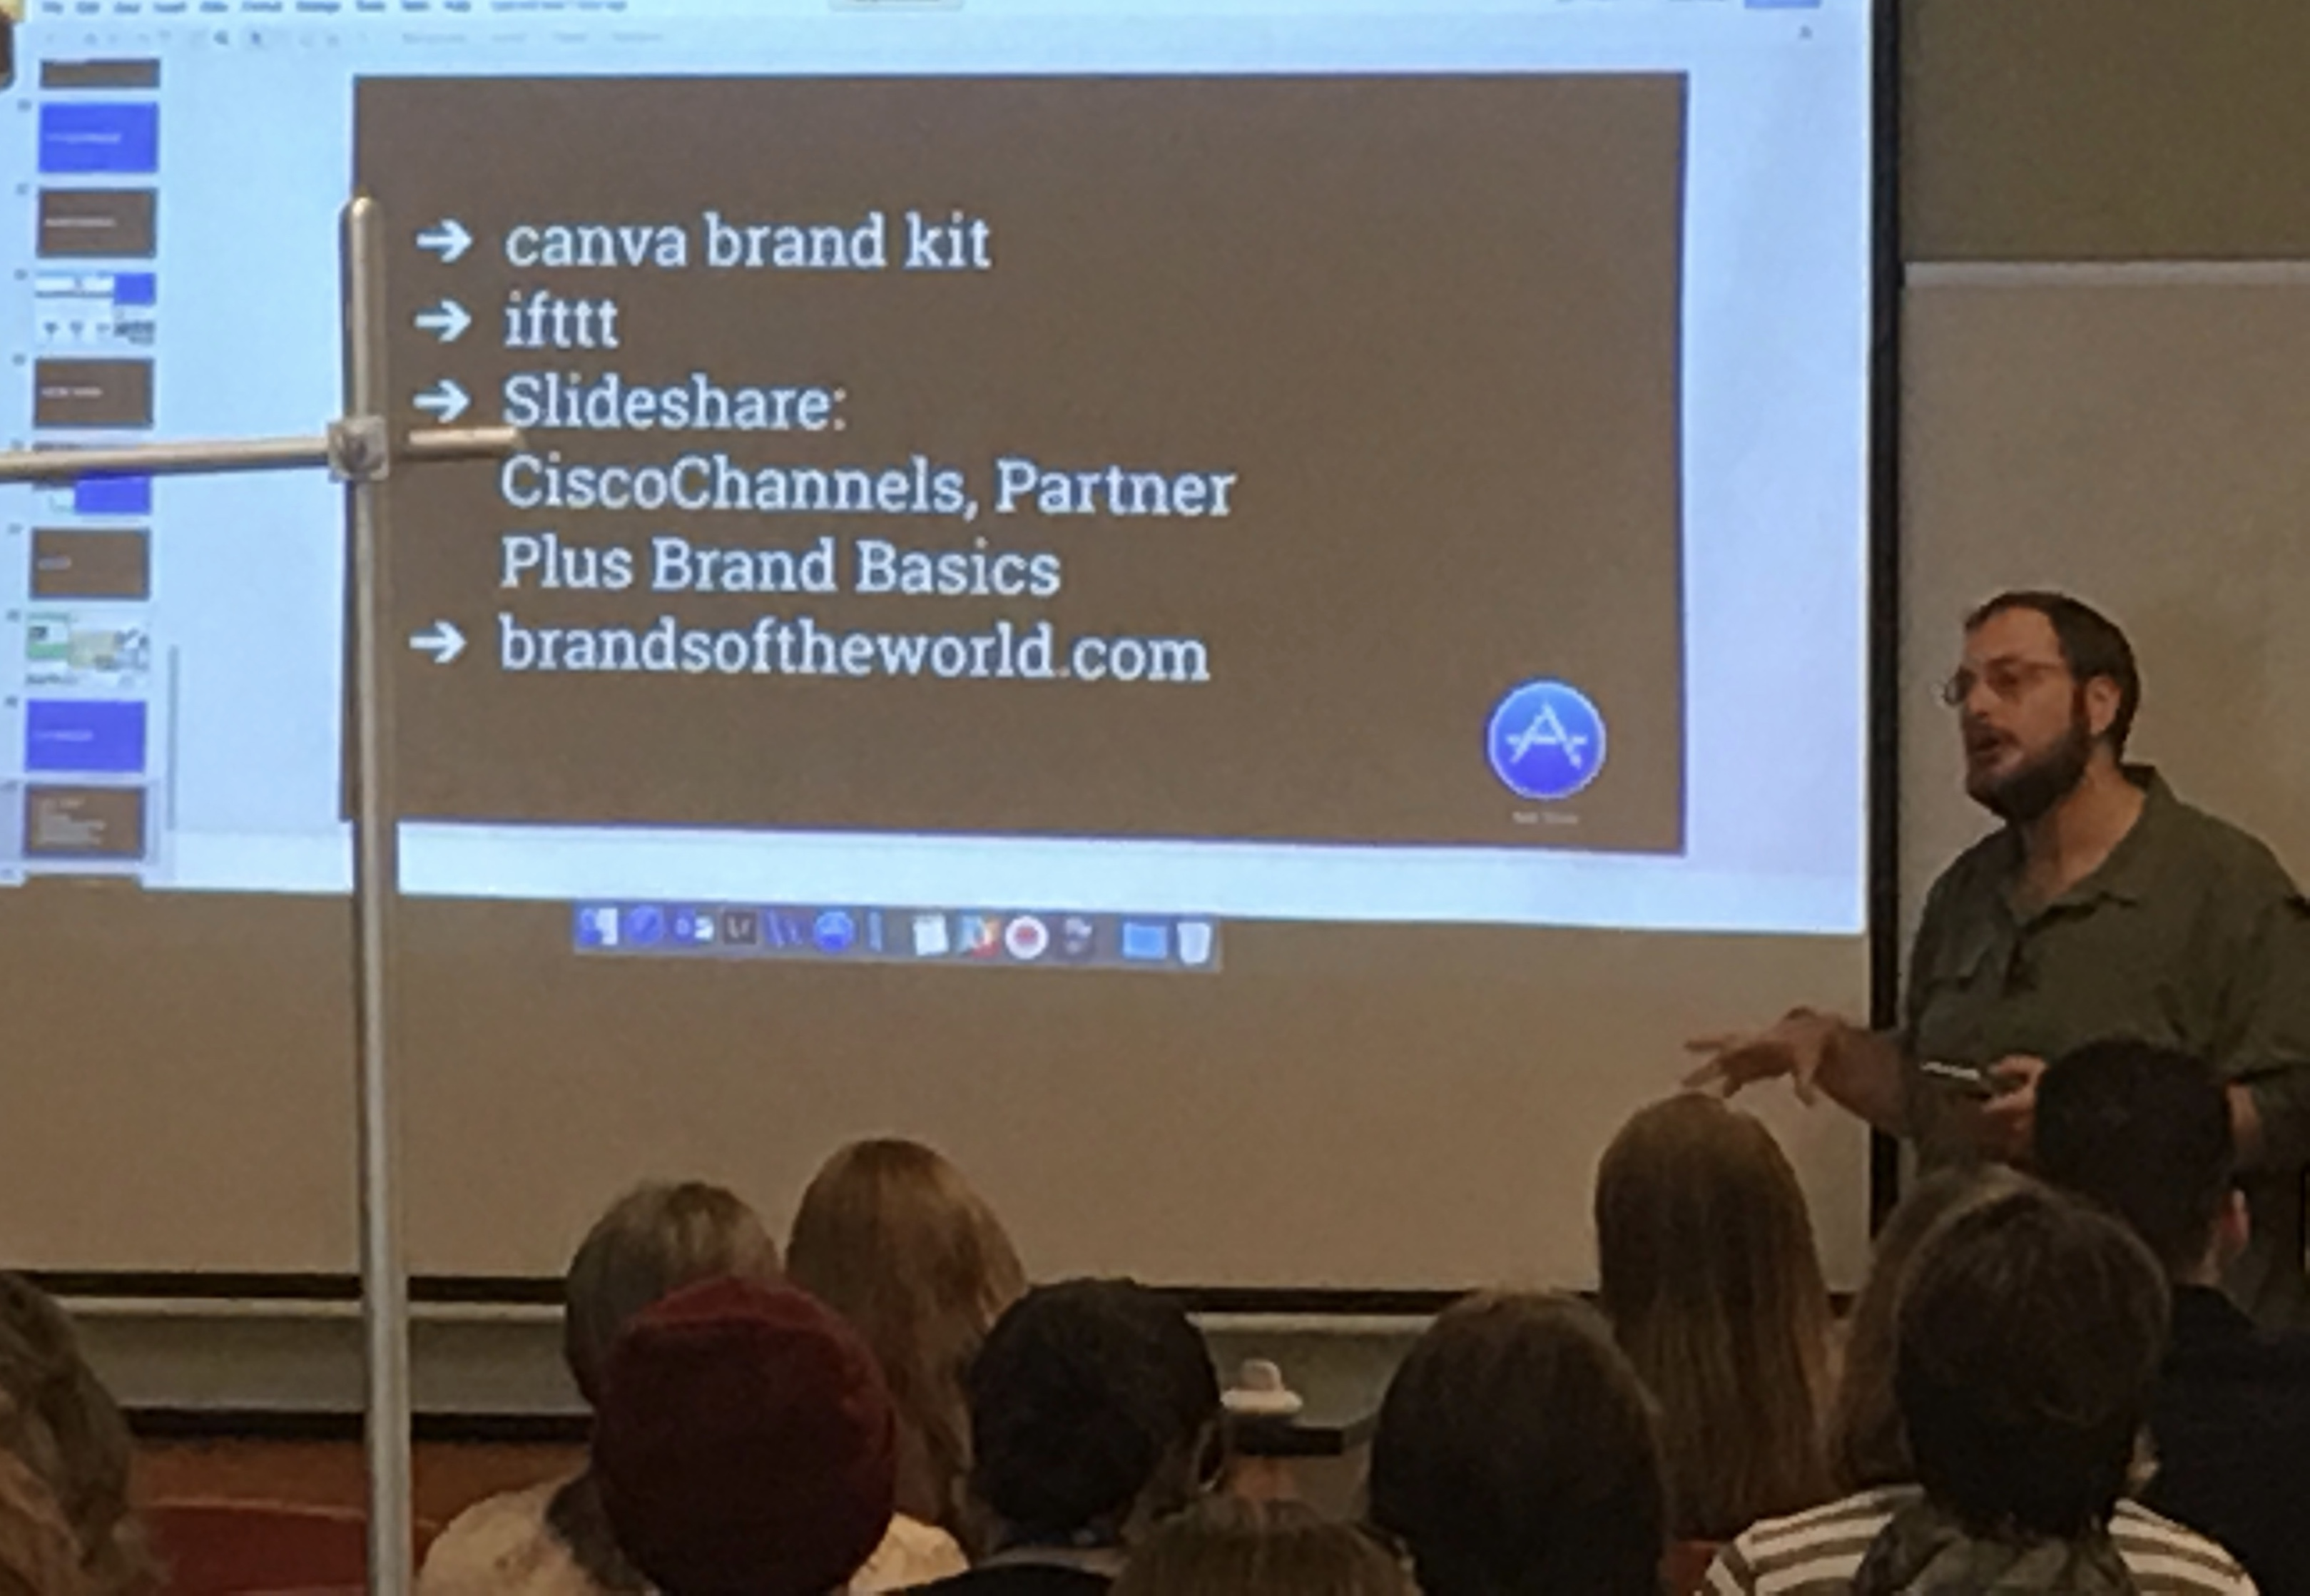 Mendel Kurland suggesting branding tools inspiration.